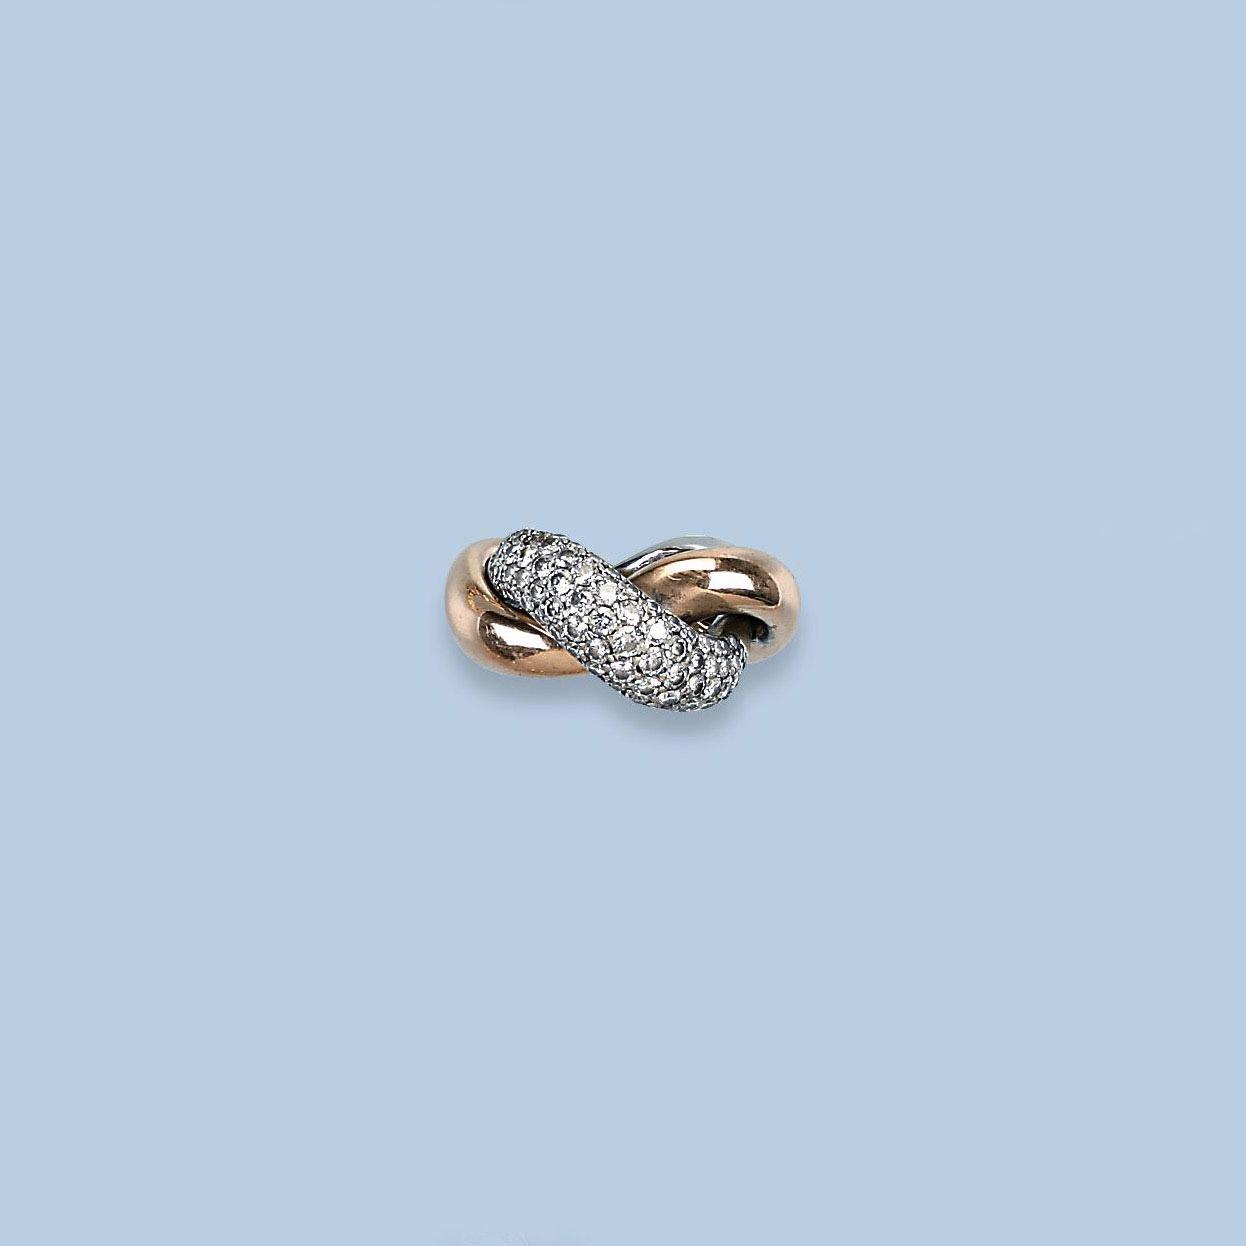 A CONTEMPORARY DIAMOND RING, B